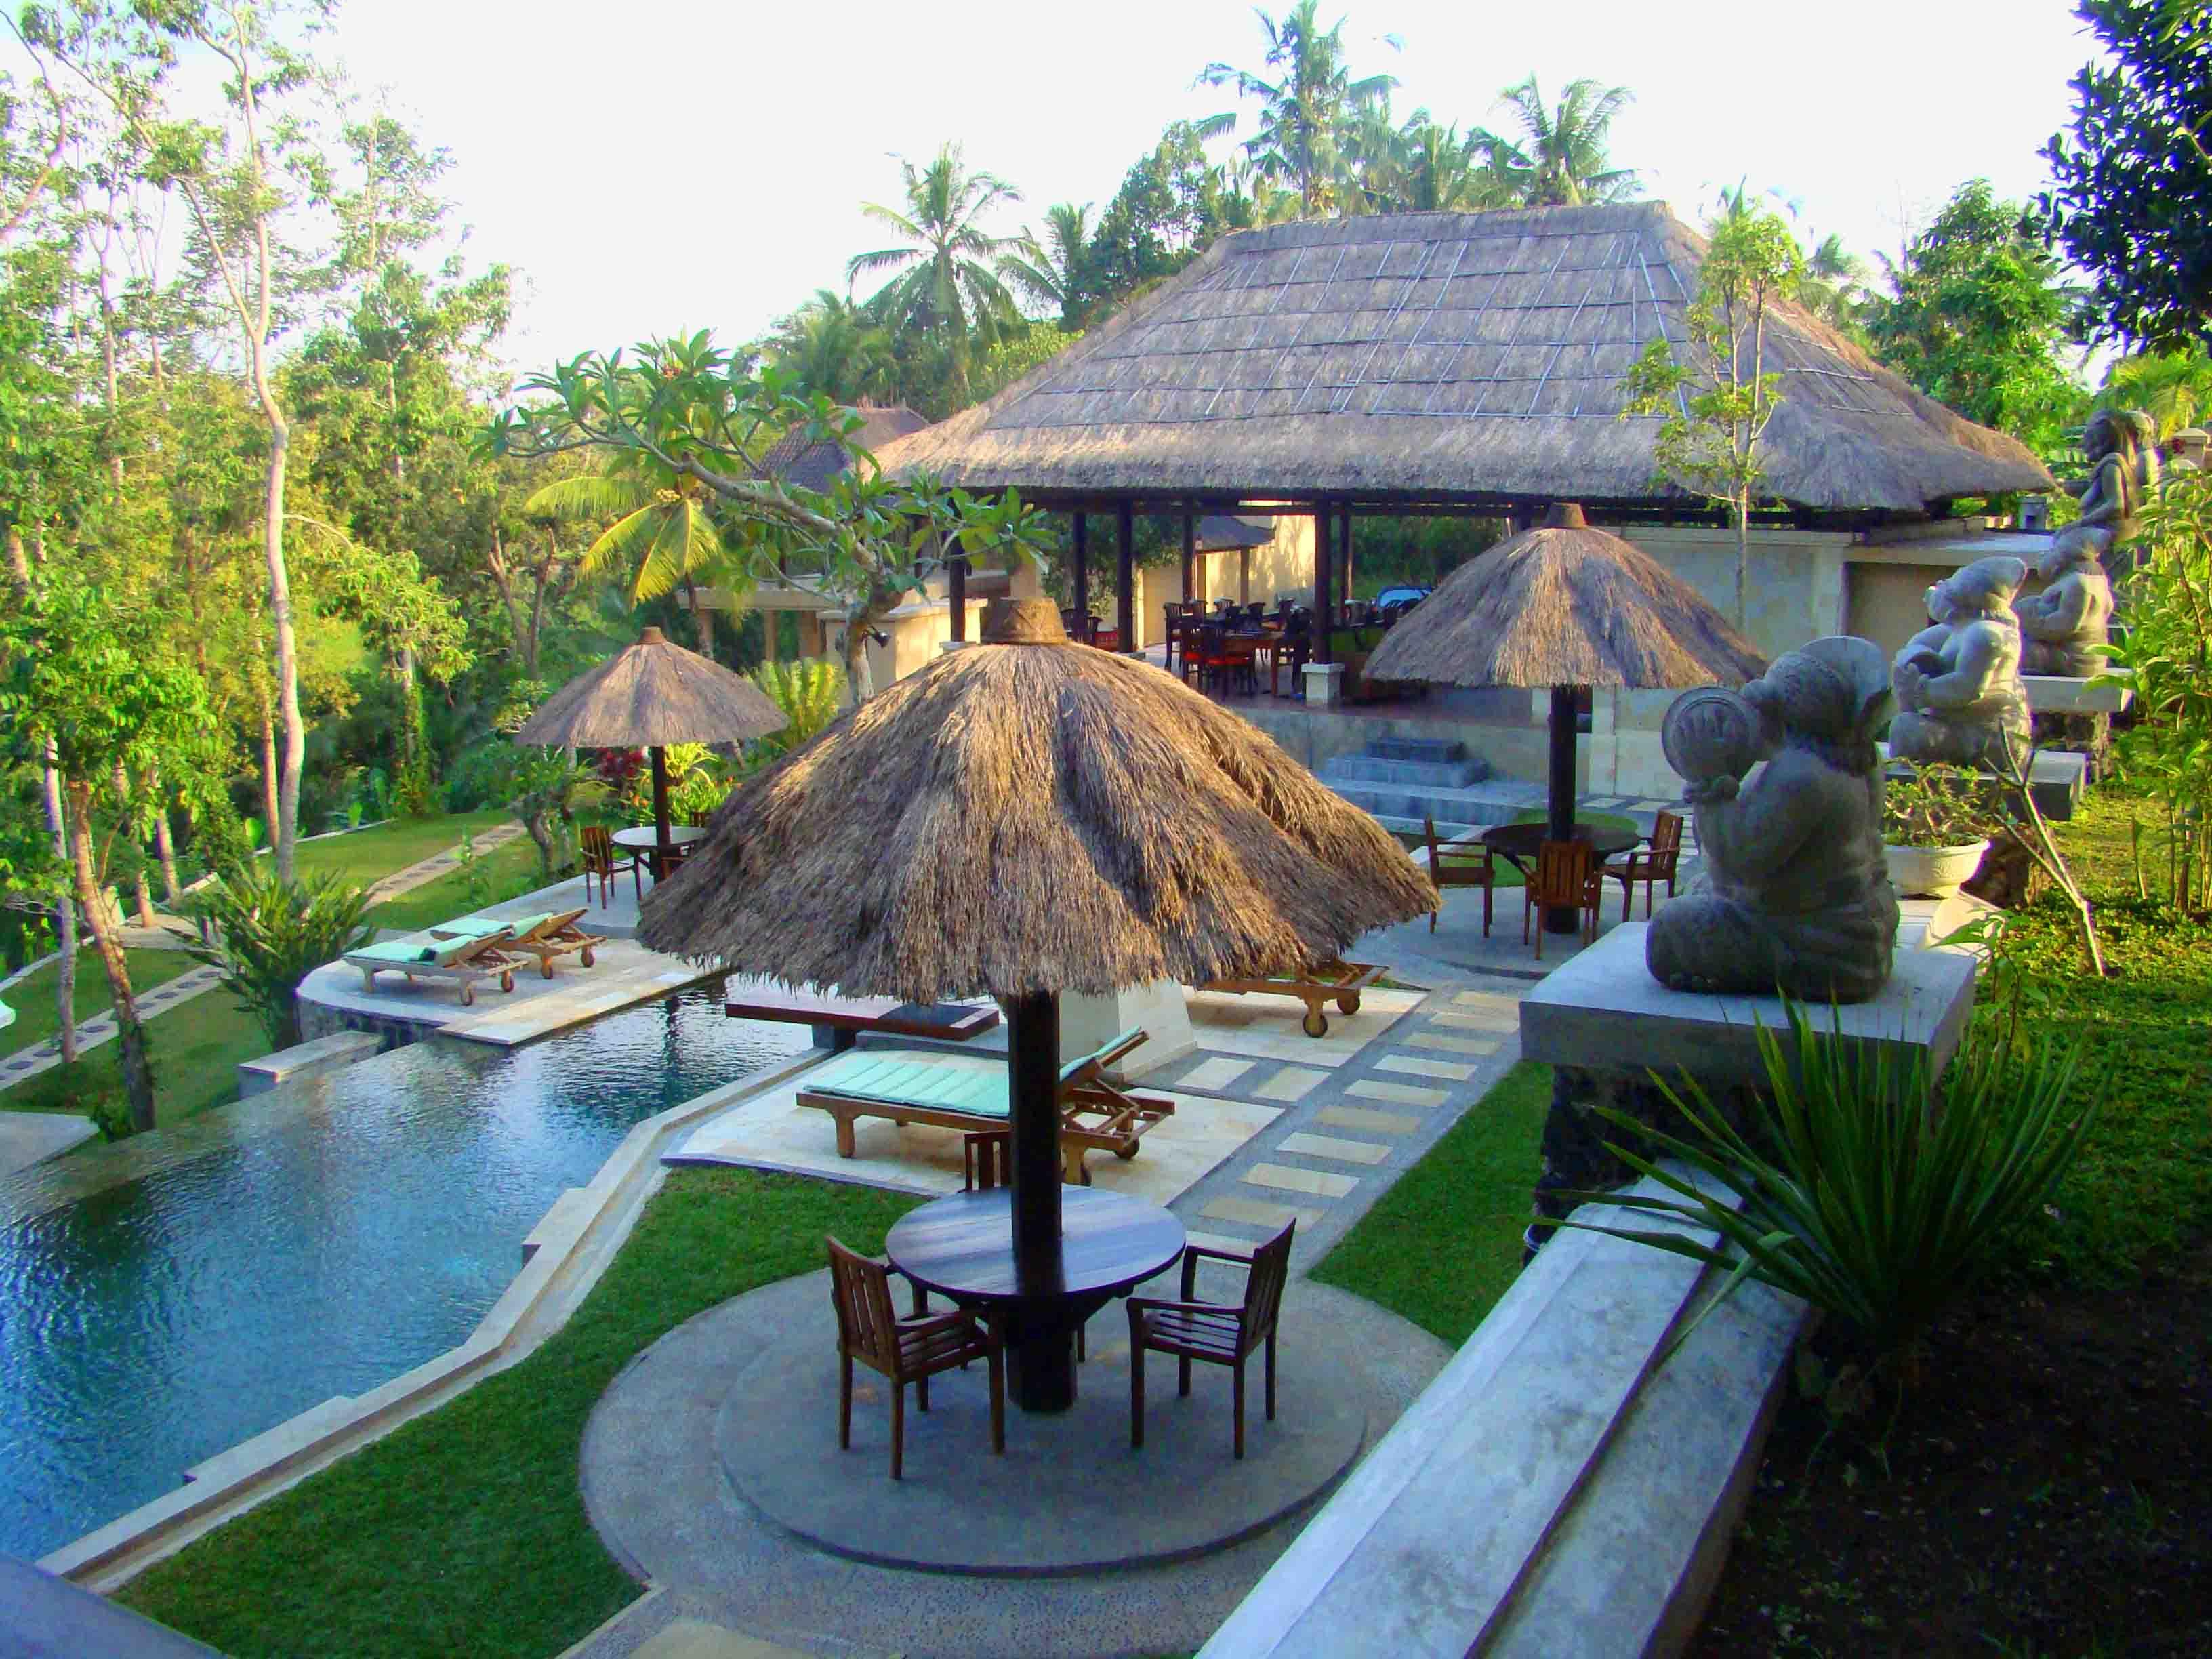 Beji ubud resort bali hotel villa blog culture travel for Garden pool villa ubud village resort